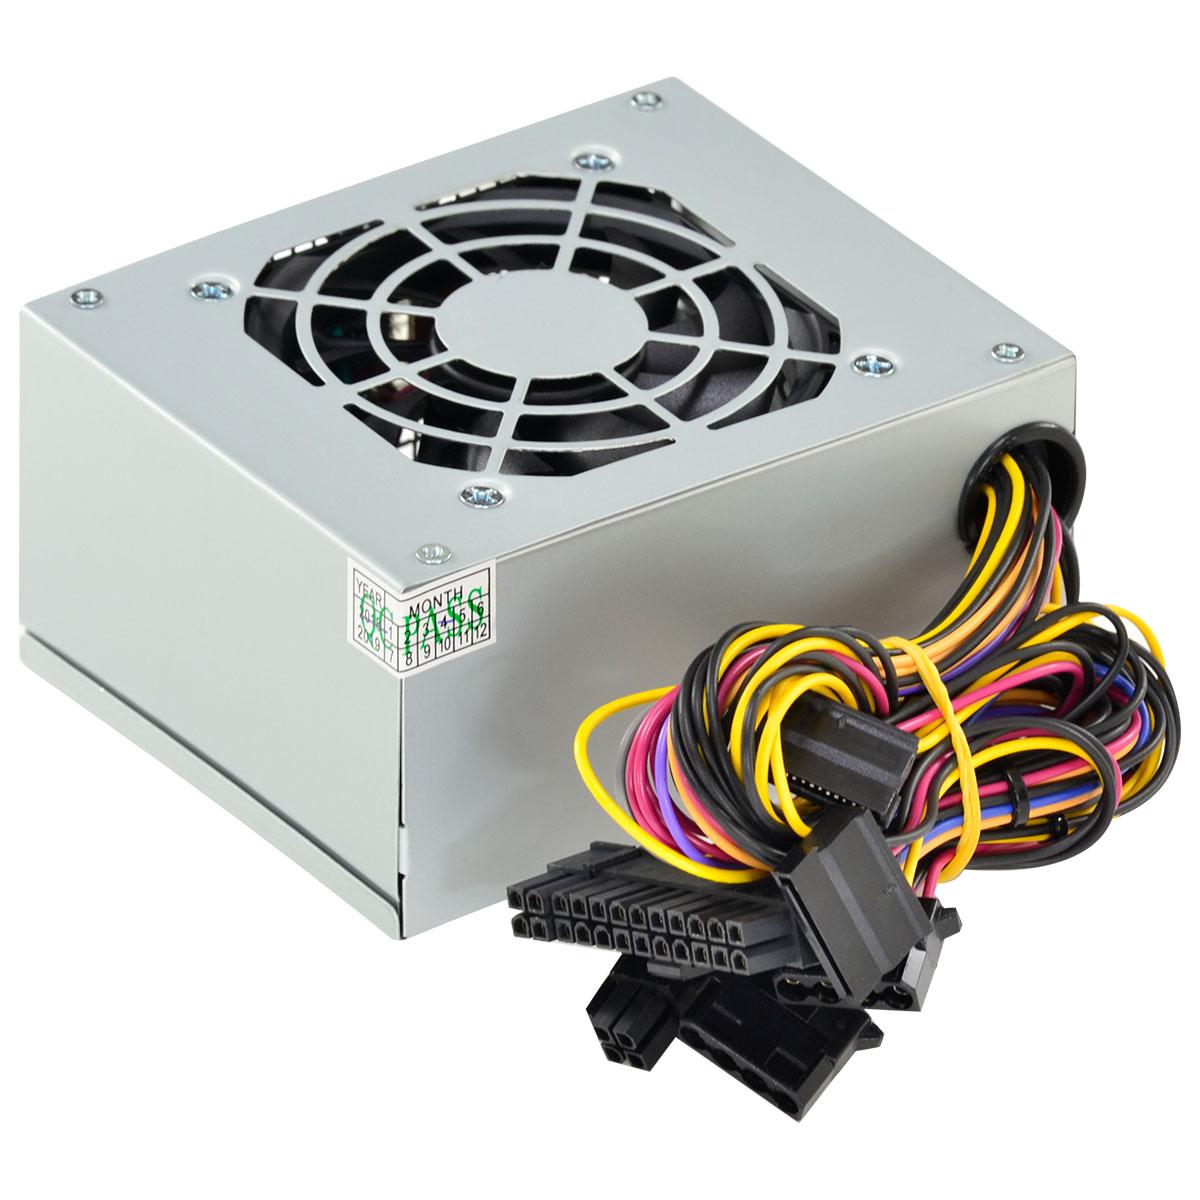 COMPUTADOR LITE INTEL DUAL CORE J1800 2.41GHZ MEMÓRIA 4GB HD 500GB FONTE 275W GABINETE SLIM - LINUX